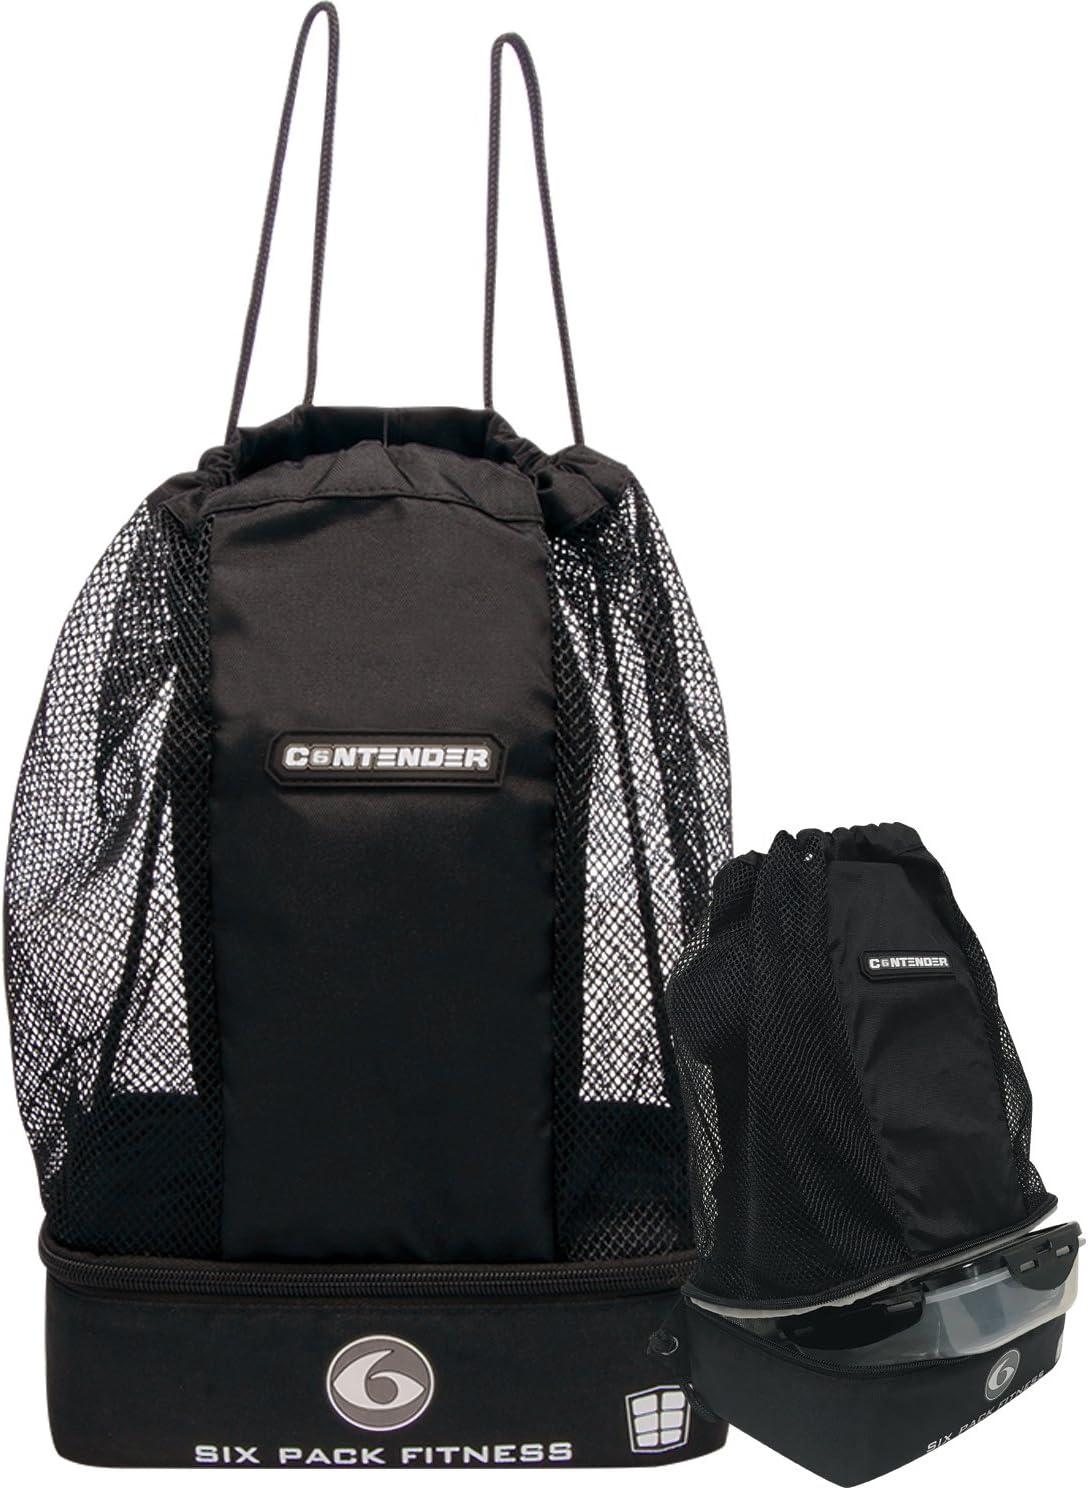 6 Pack Fitness Contender, Stealth, pequeño: Amazon.es: Deportes y aire libre